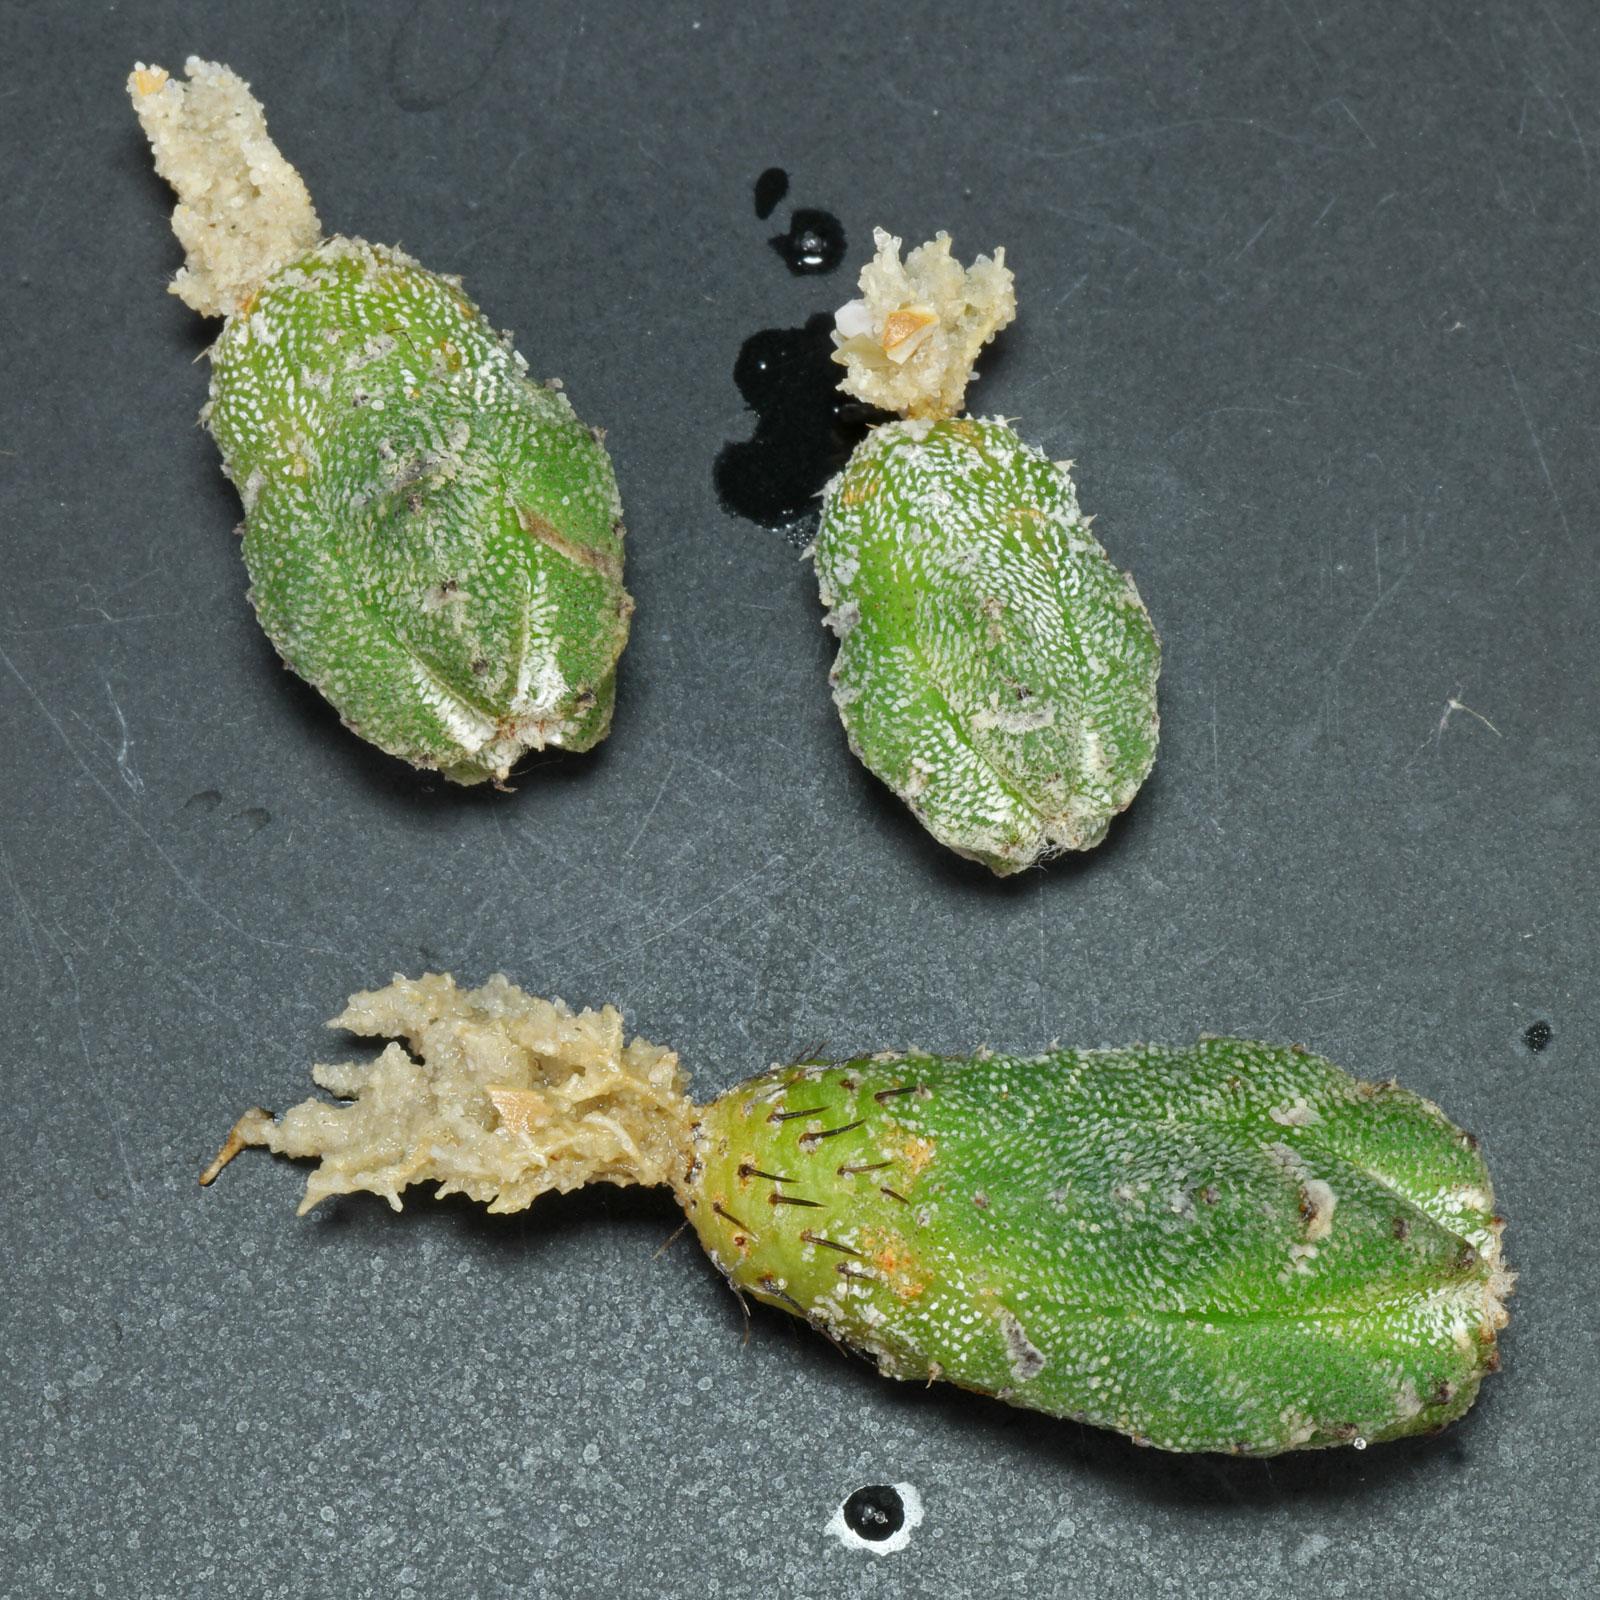 Astrophytum myriostigma Huboki Stecklinge